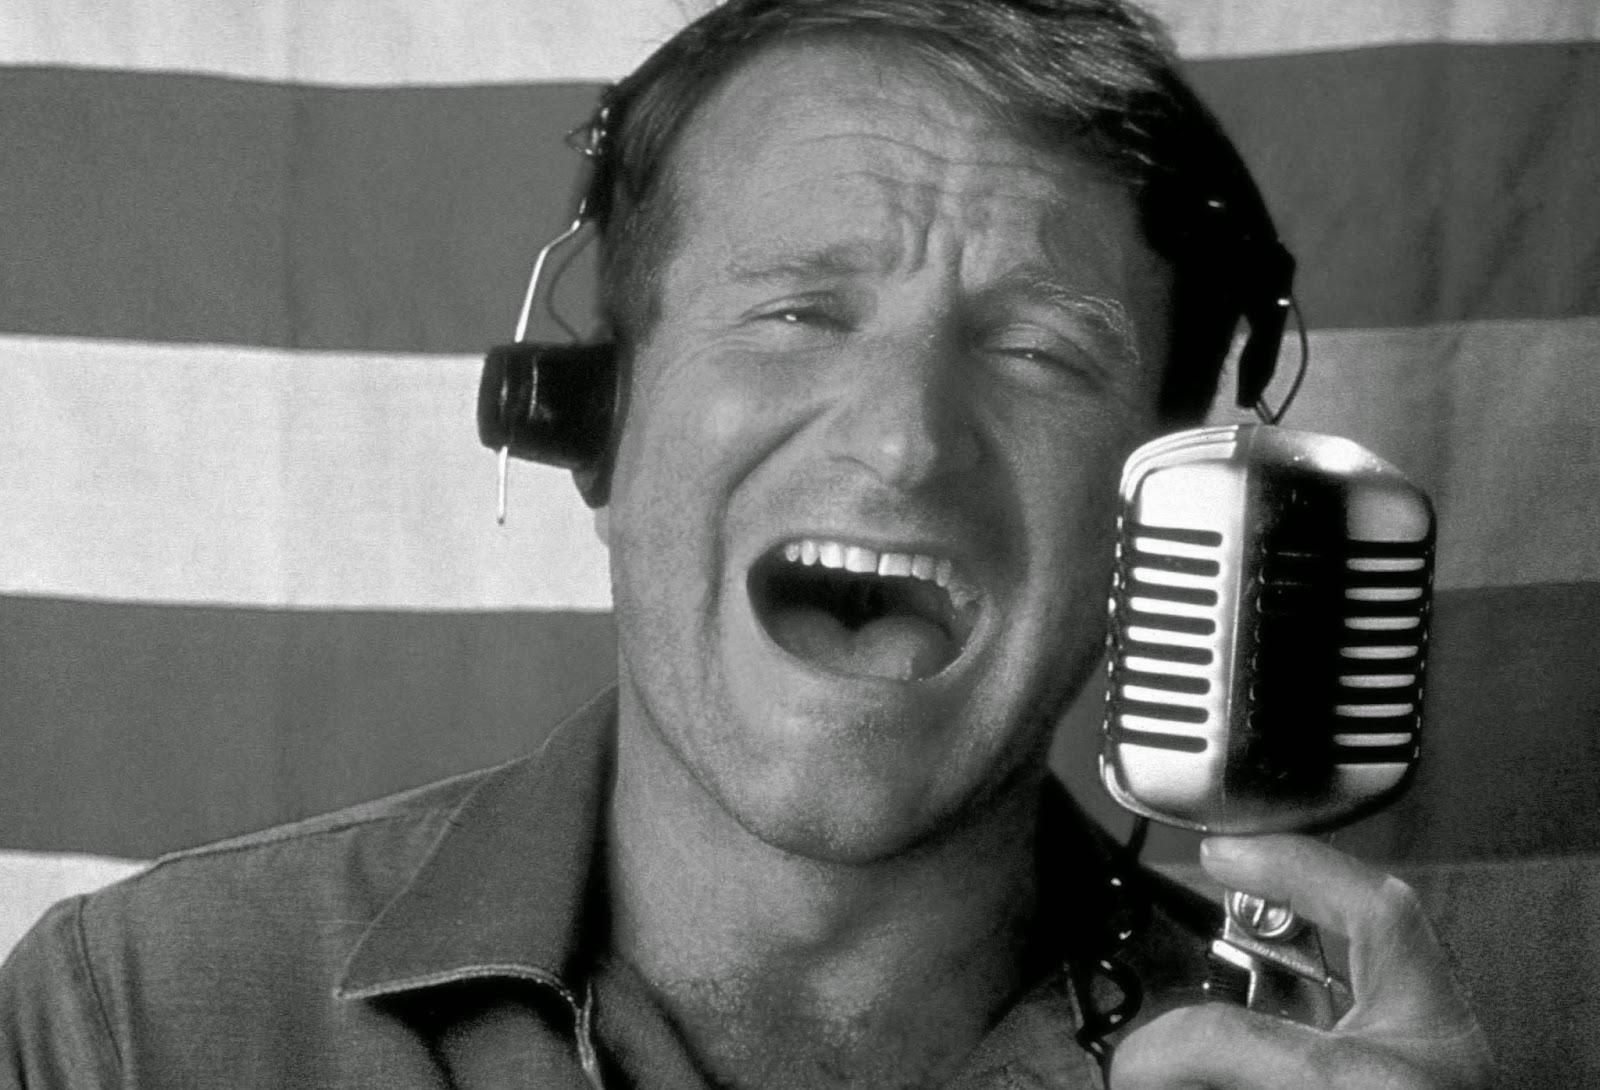 Reel Speak: Robin Williams 1951 2014